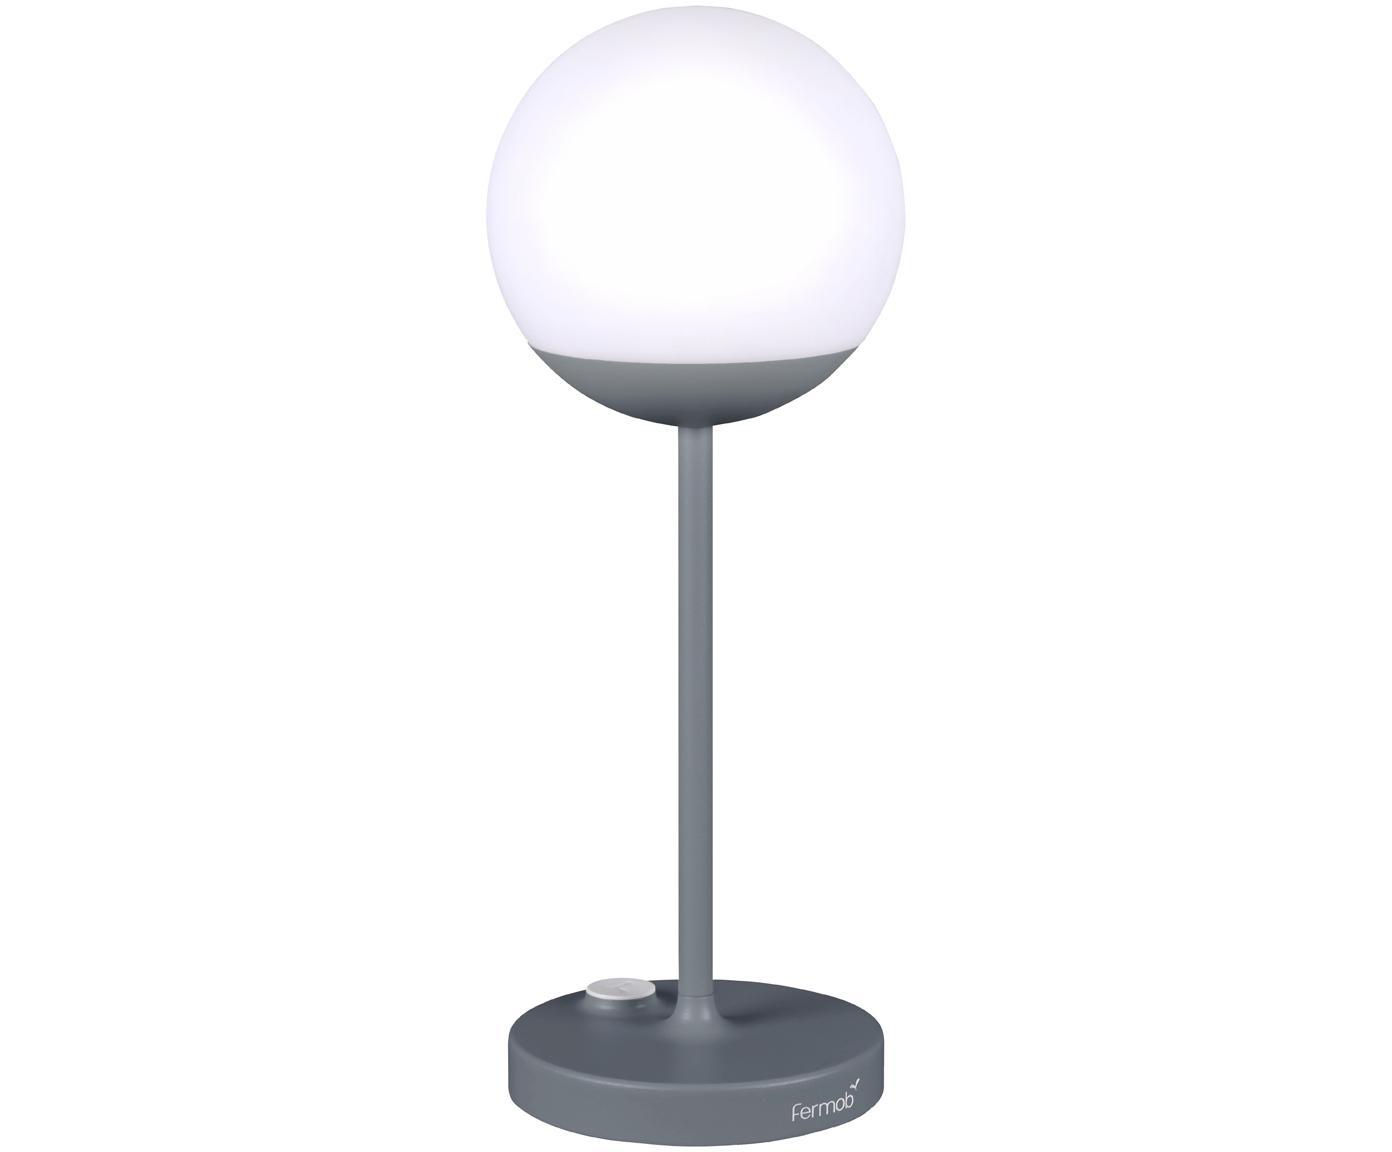 Mobile LED Aussenleuchte Mooon, Lampenschirm: Kunststoff, Gewittergrau, Ø 15 x H 41 cm